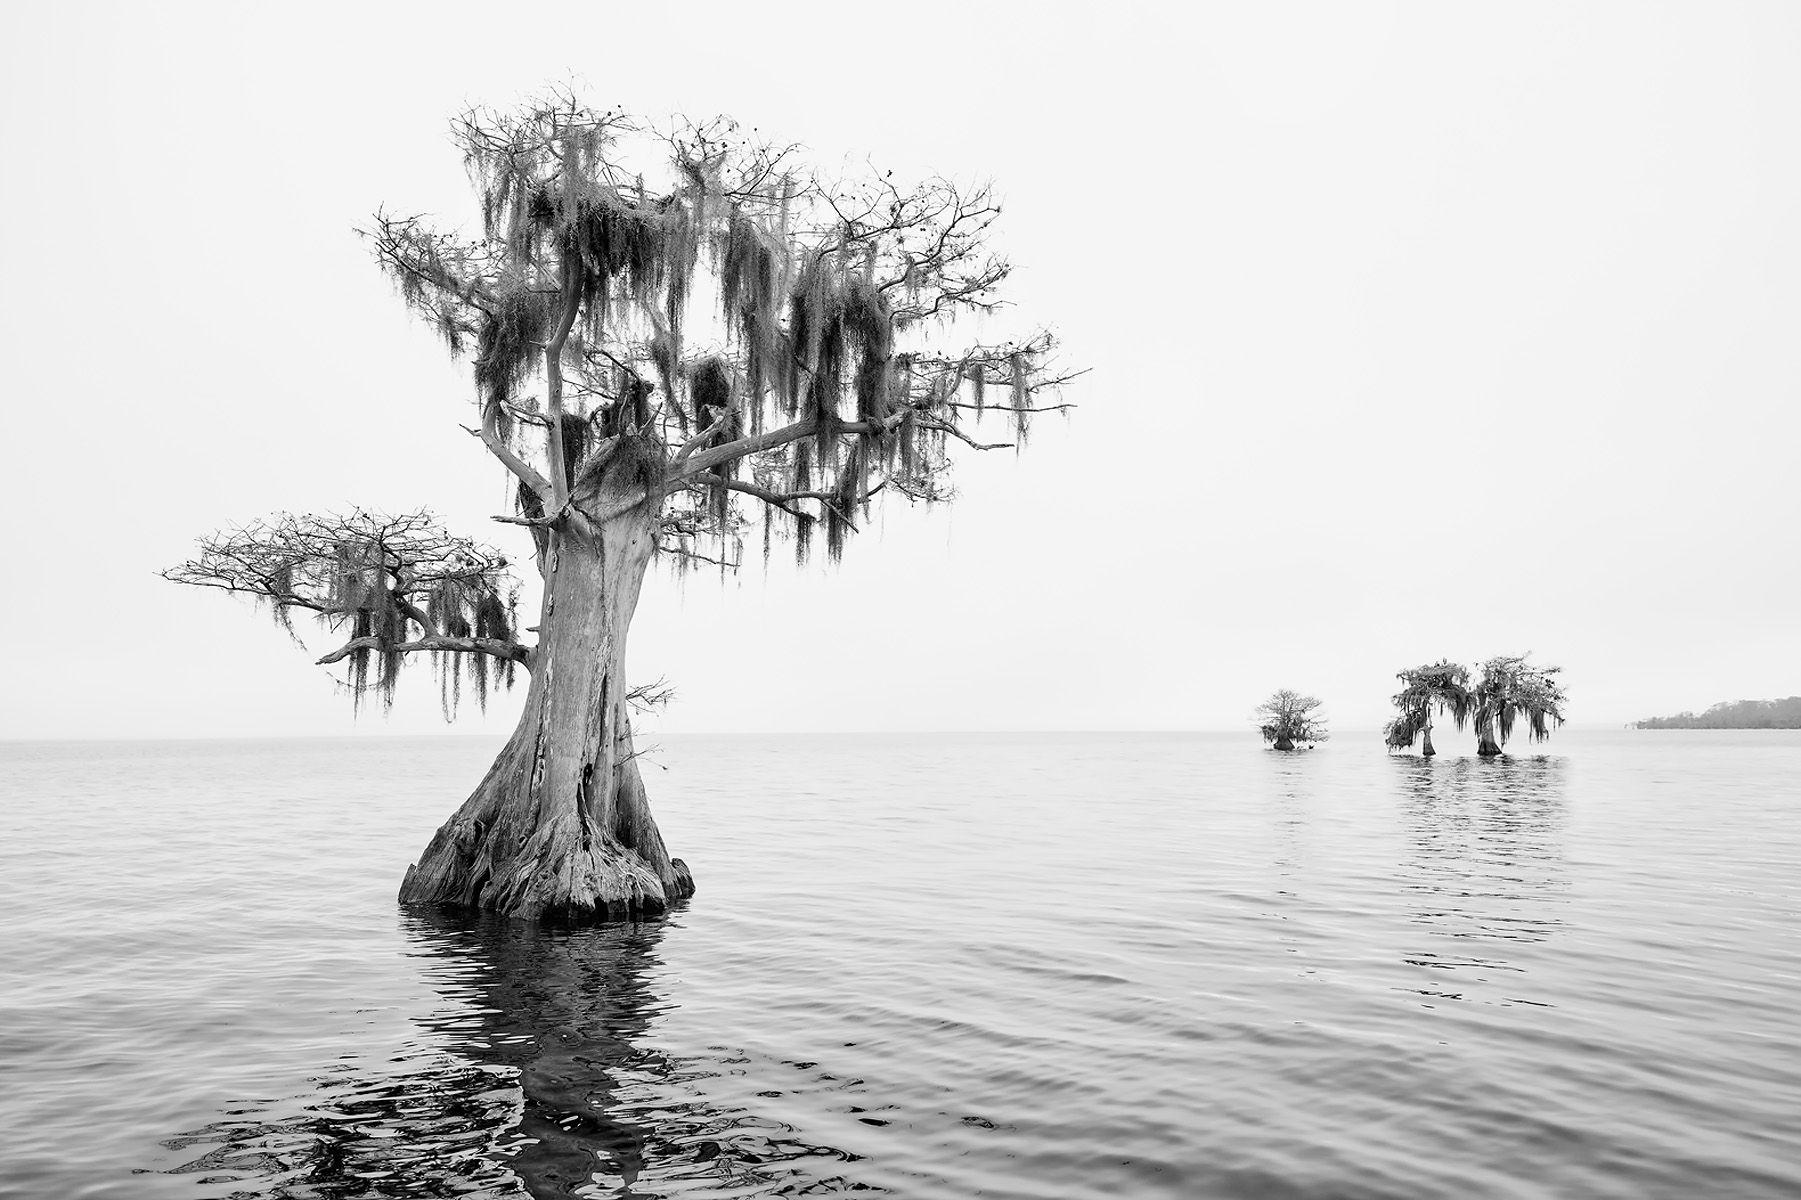 Cypress tree standing alone_B&W_S6A0571-Lake Blue Cypress, FL, USA.jpg